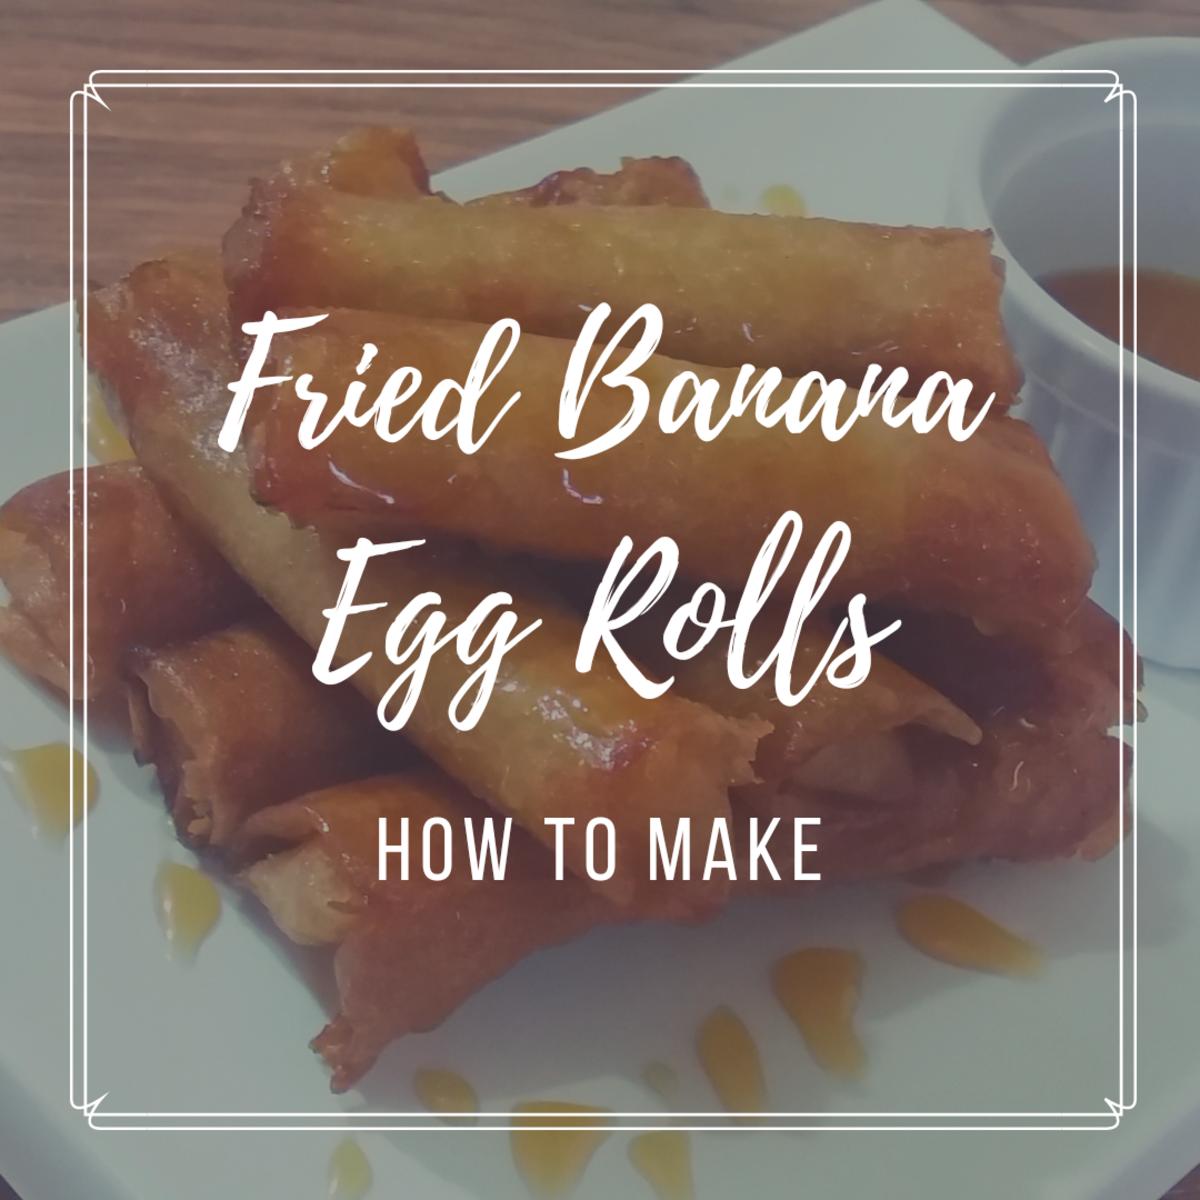 Learn how to make fried banana egg rolls